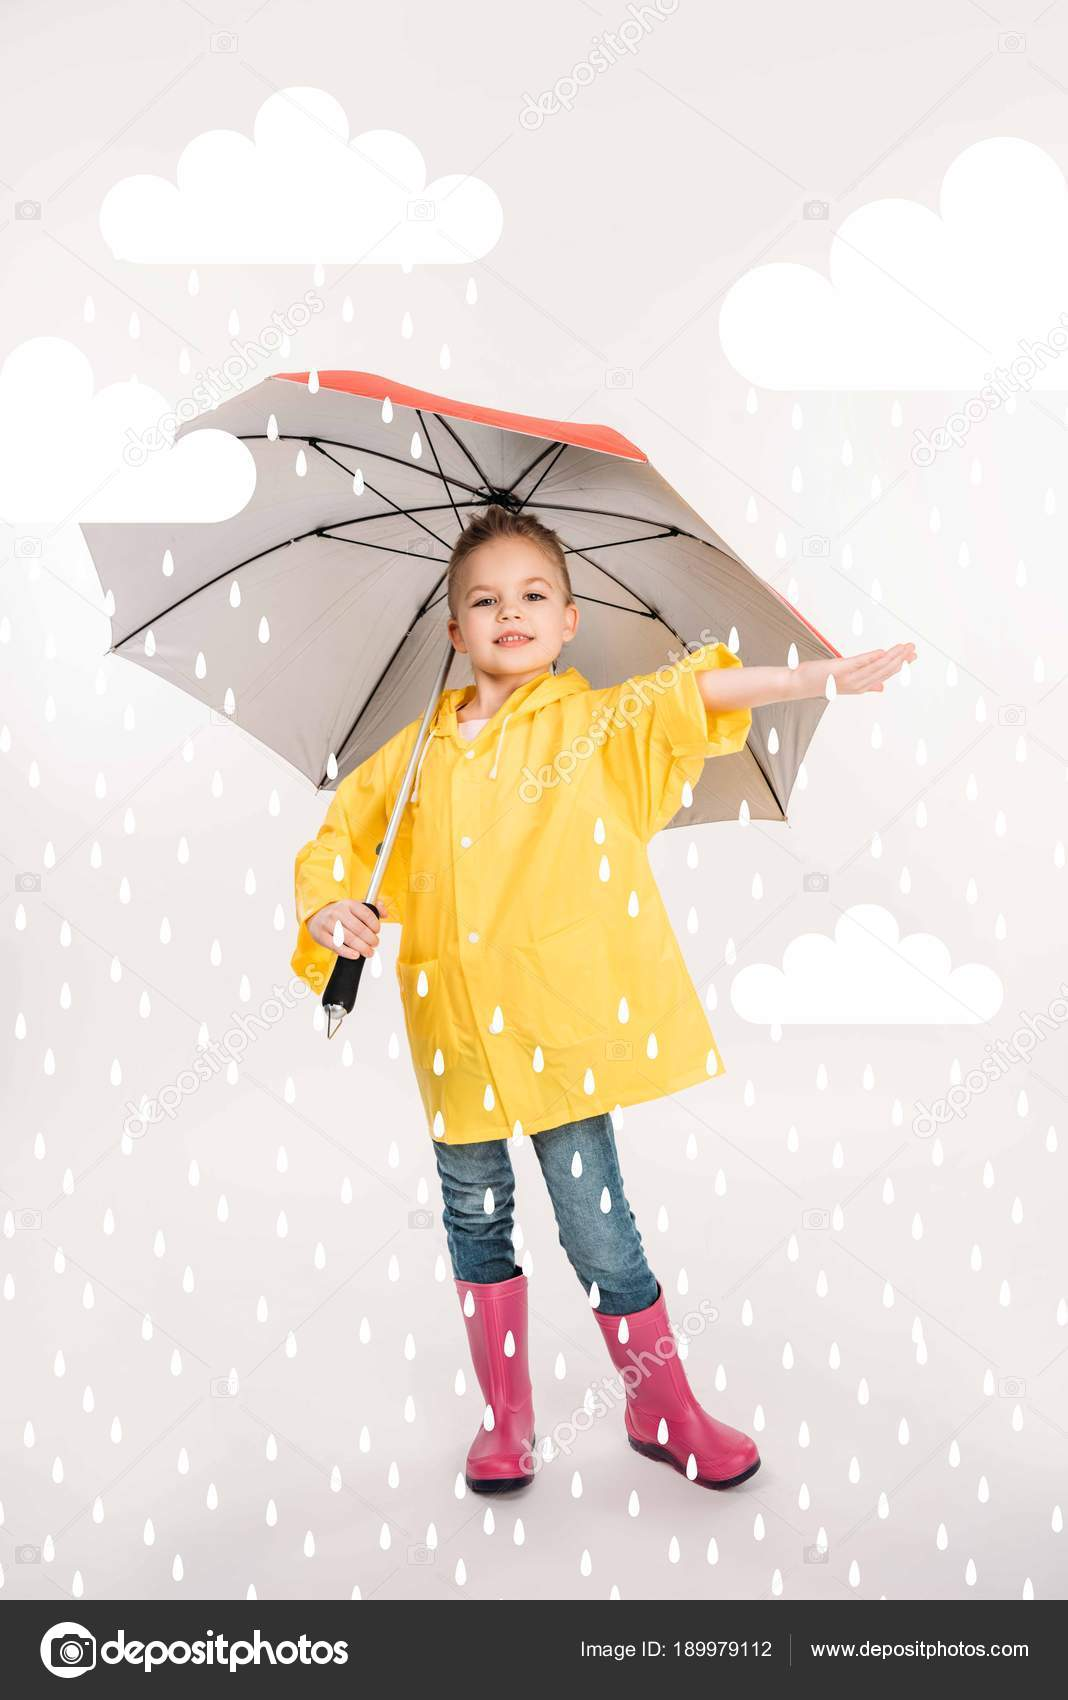 0d2857eaa Pretty Child Rubber Boots Yellow Raincoat Umbrella Rainy Weather ...